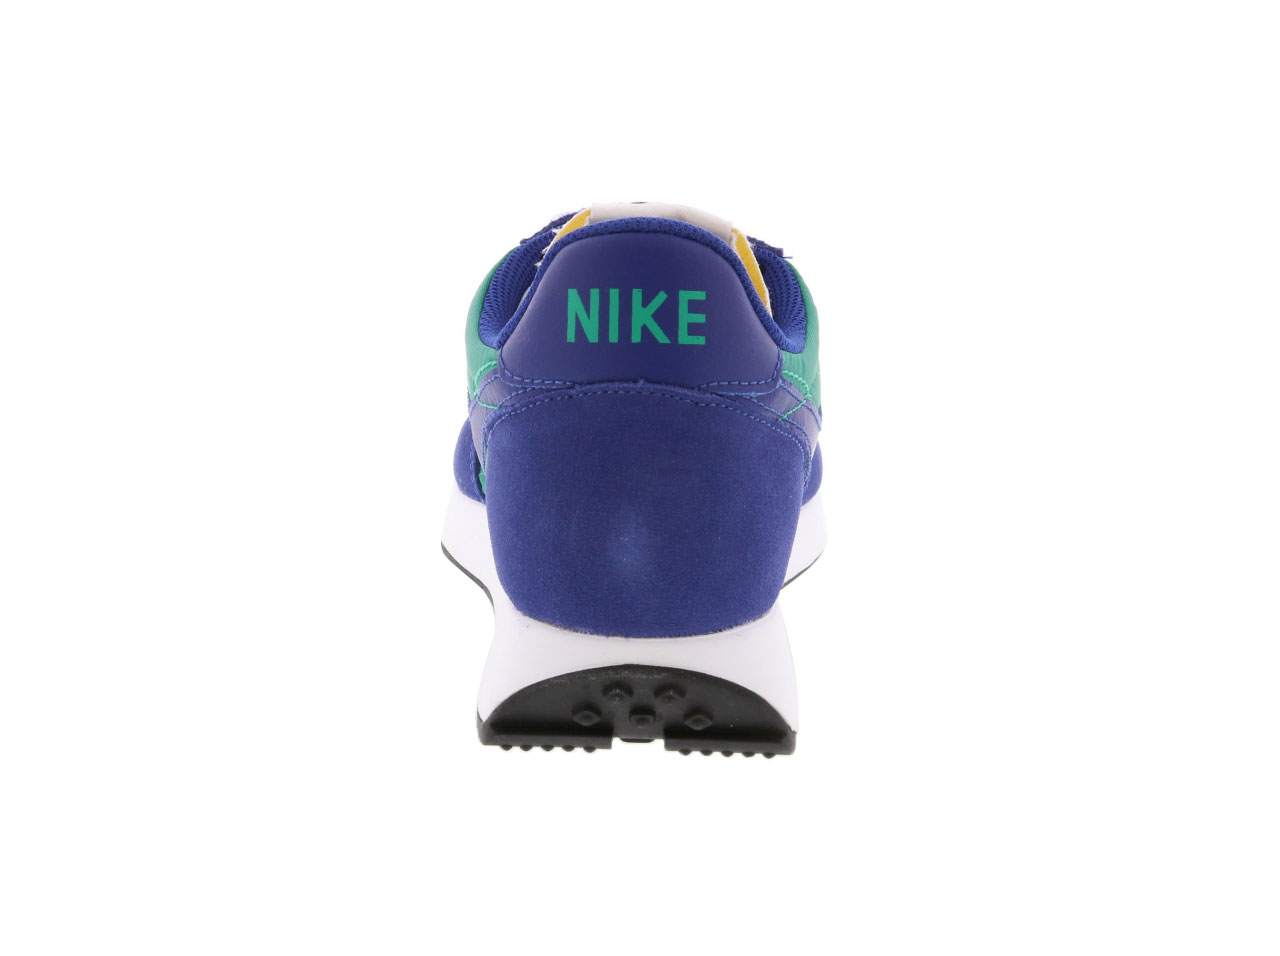 【SALE】NIKE AIR TAILWIND 79 - NEPTUNE GREEN/DEEP ROYAL/BLUE/WHITE